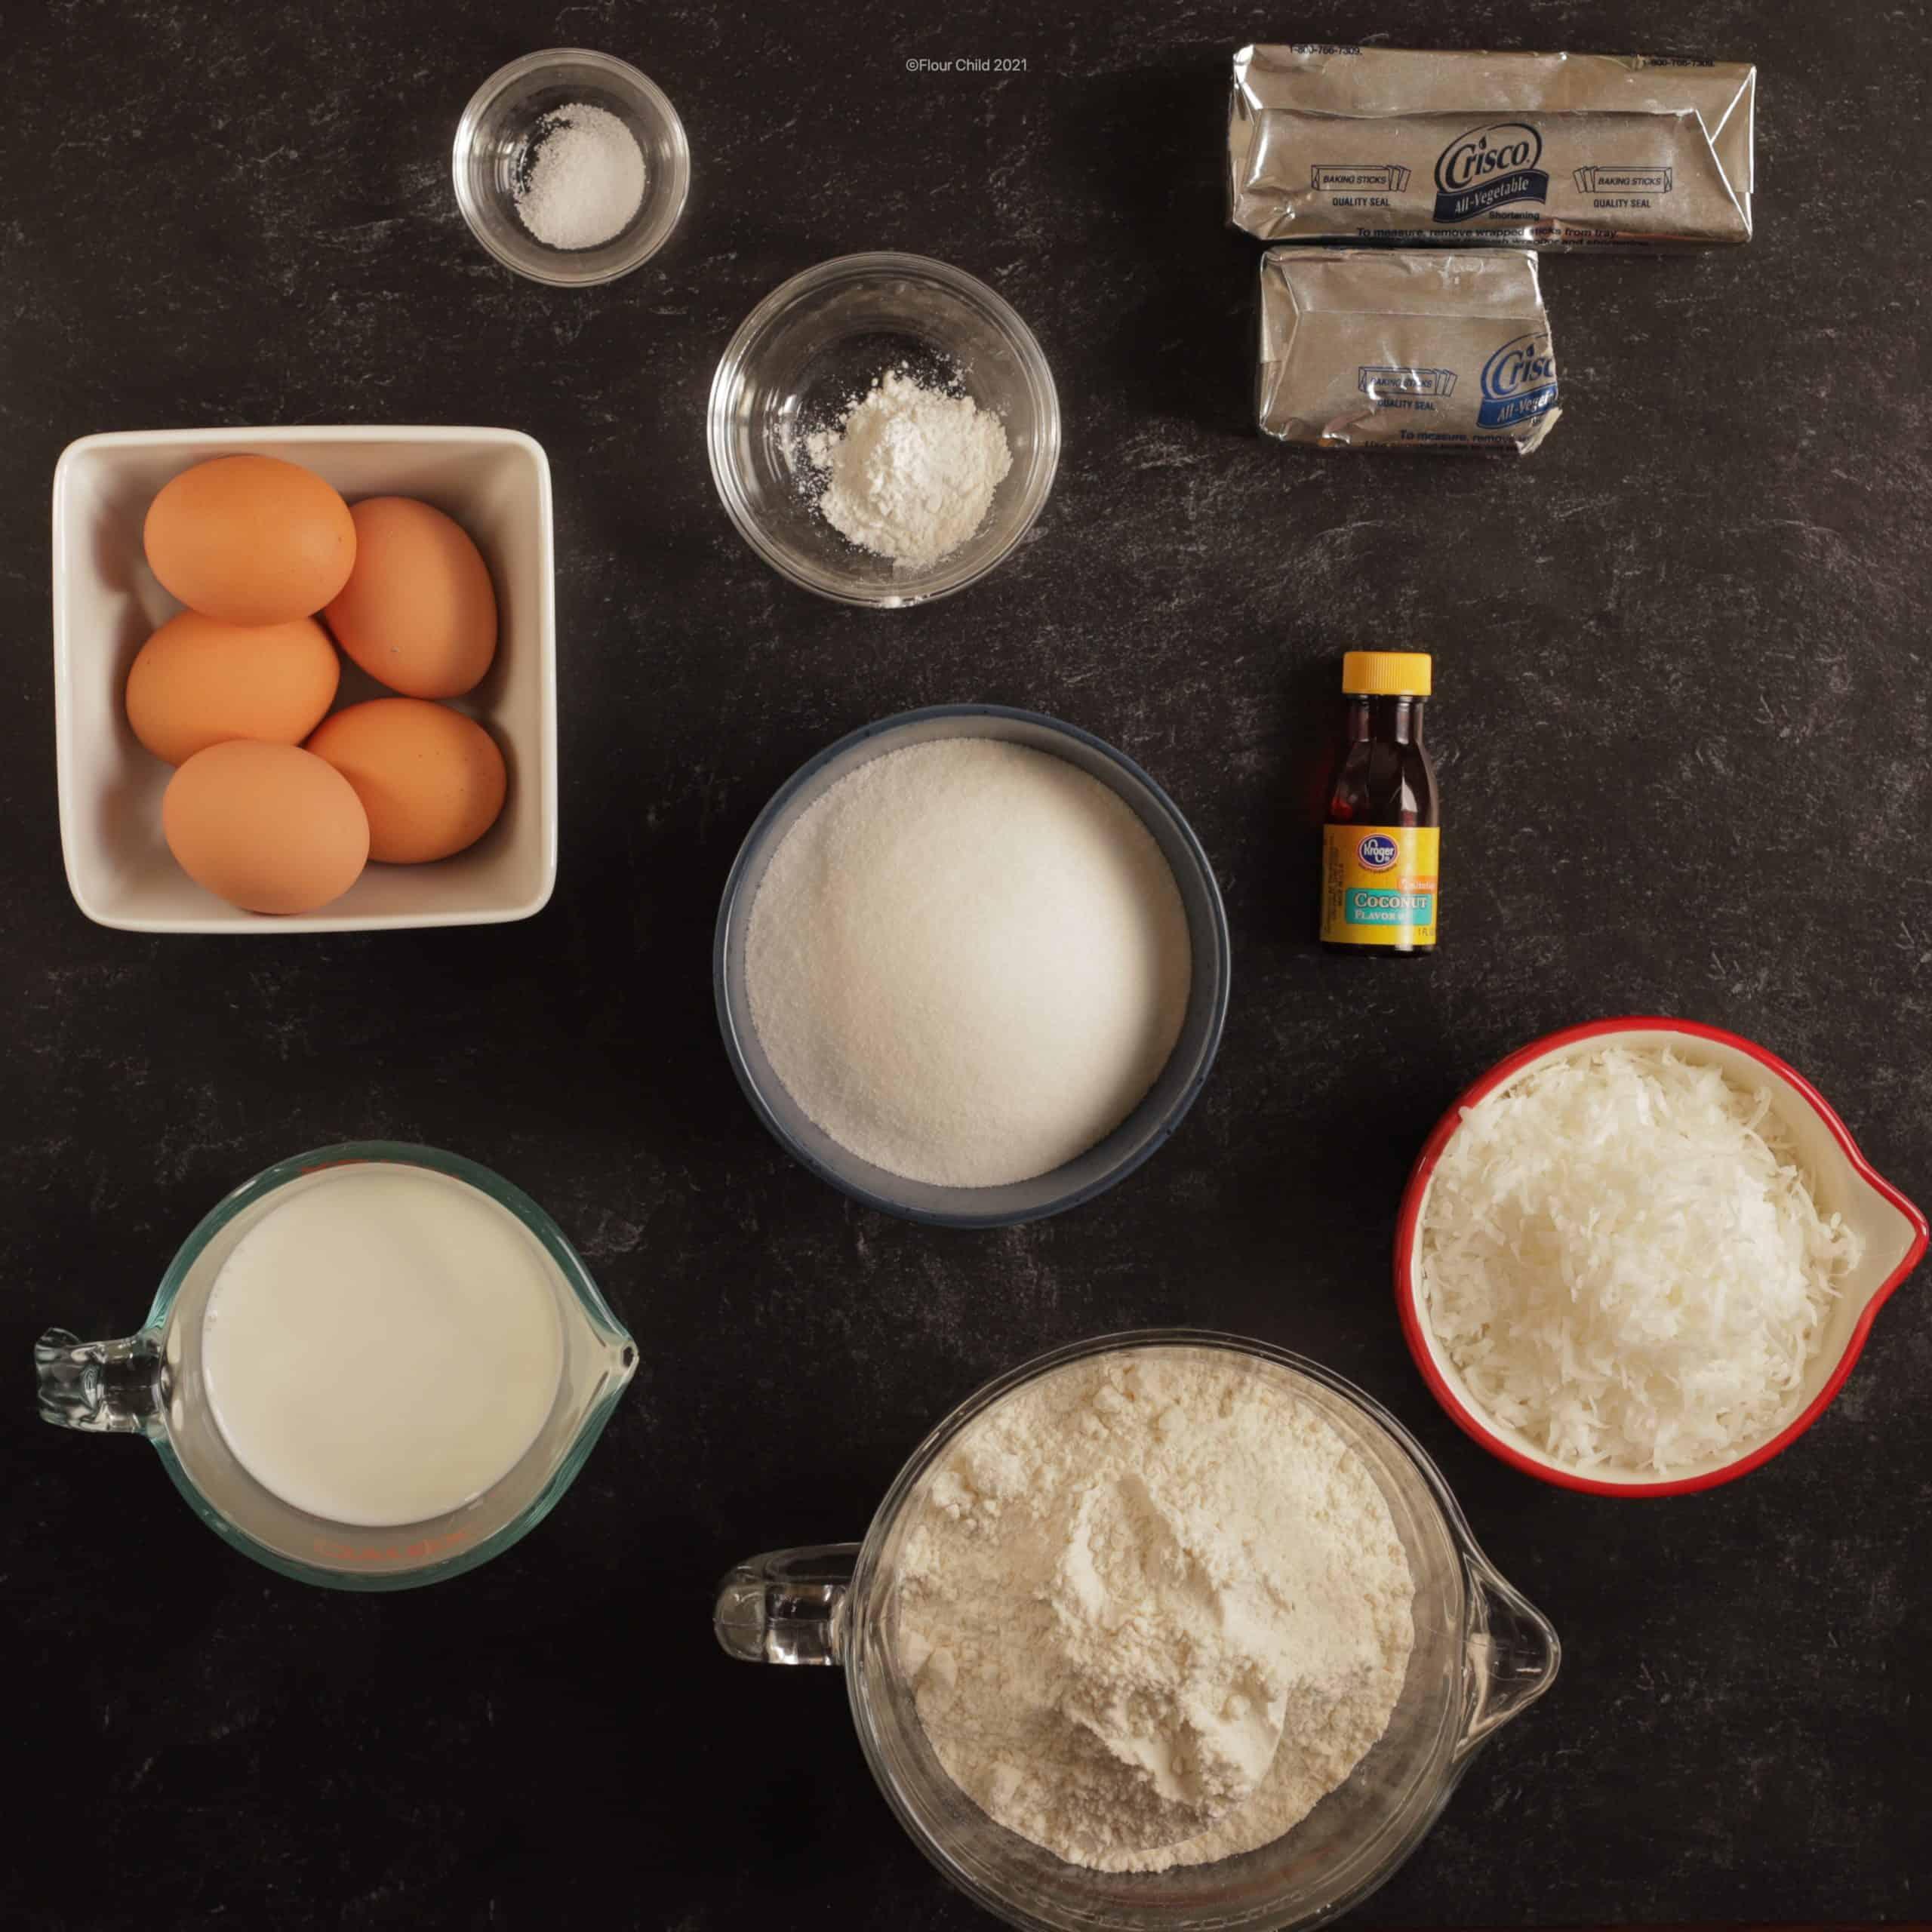 Ingredients for coconut poundcake